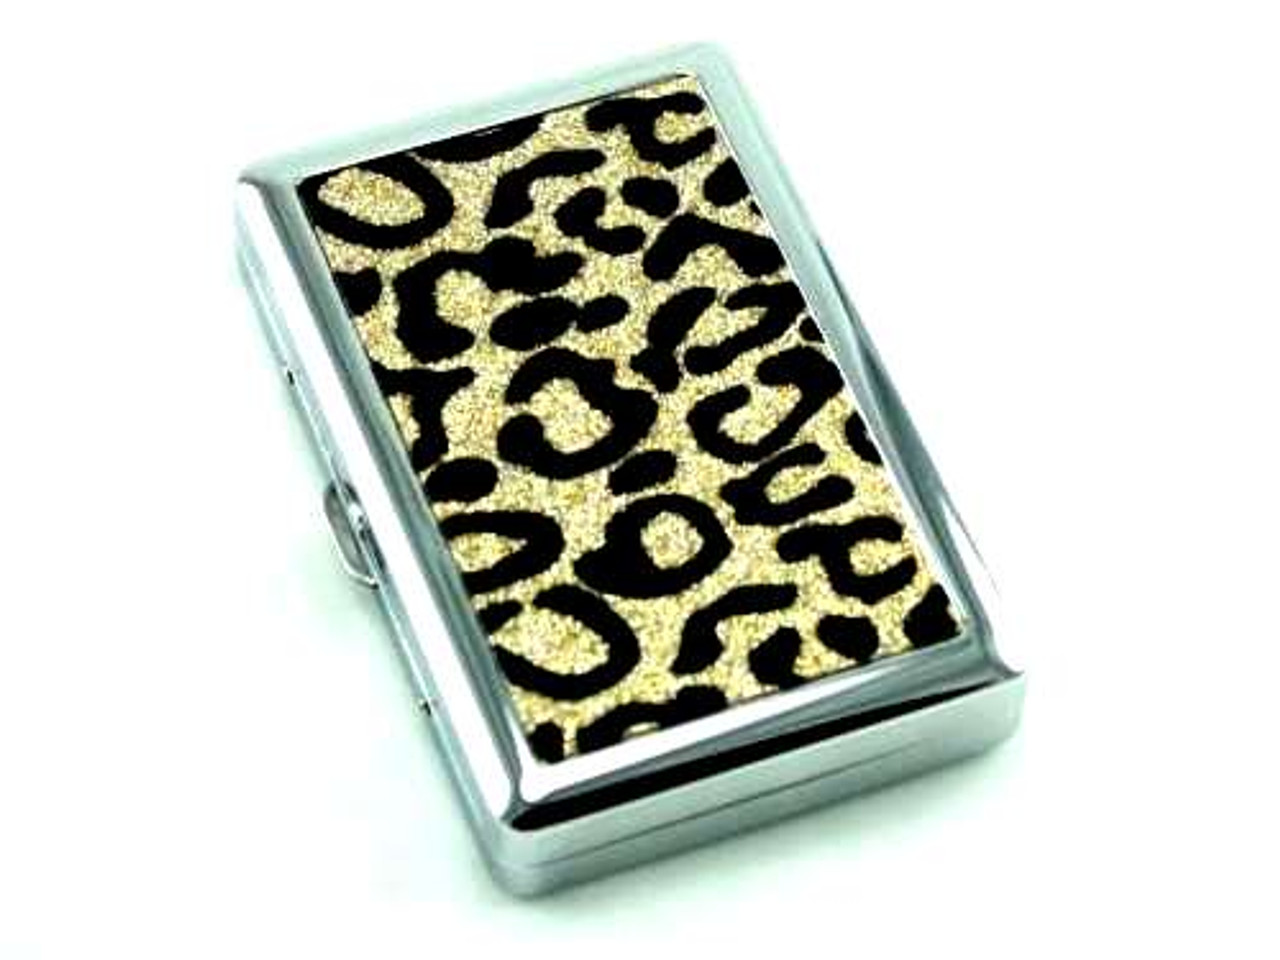 Gold Sparkling Cheetah Cigarette Case